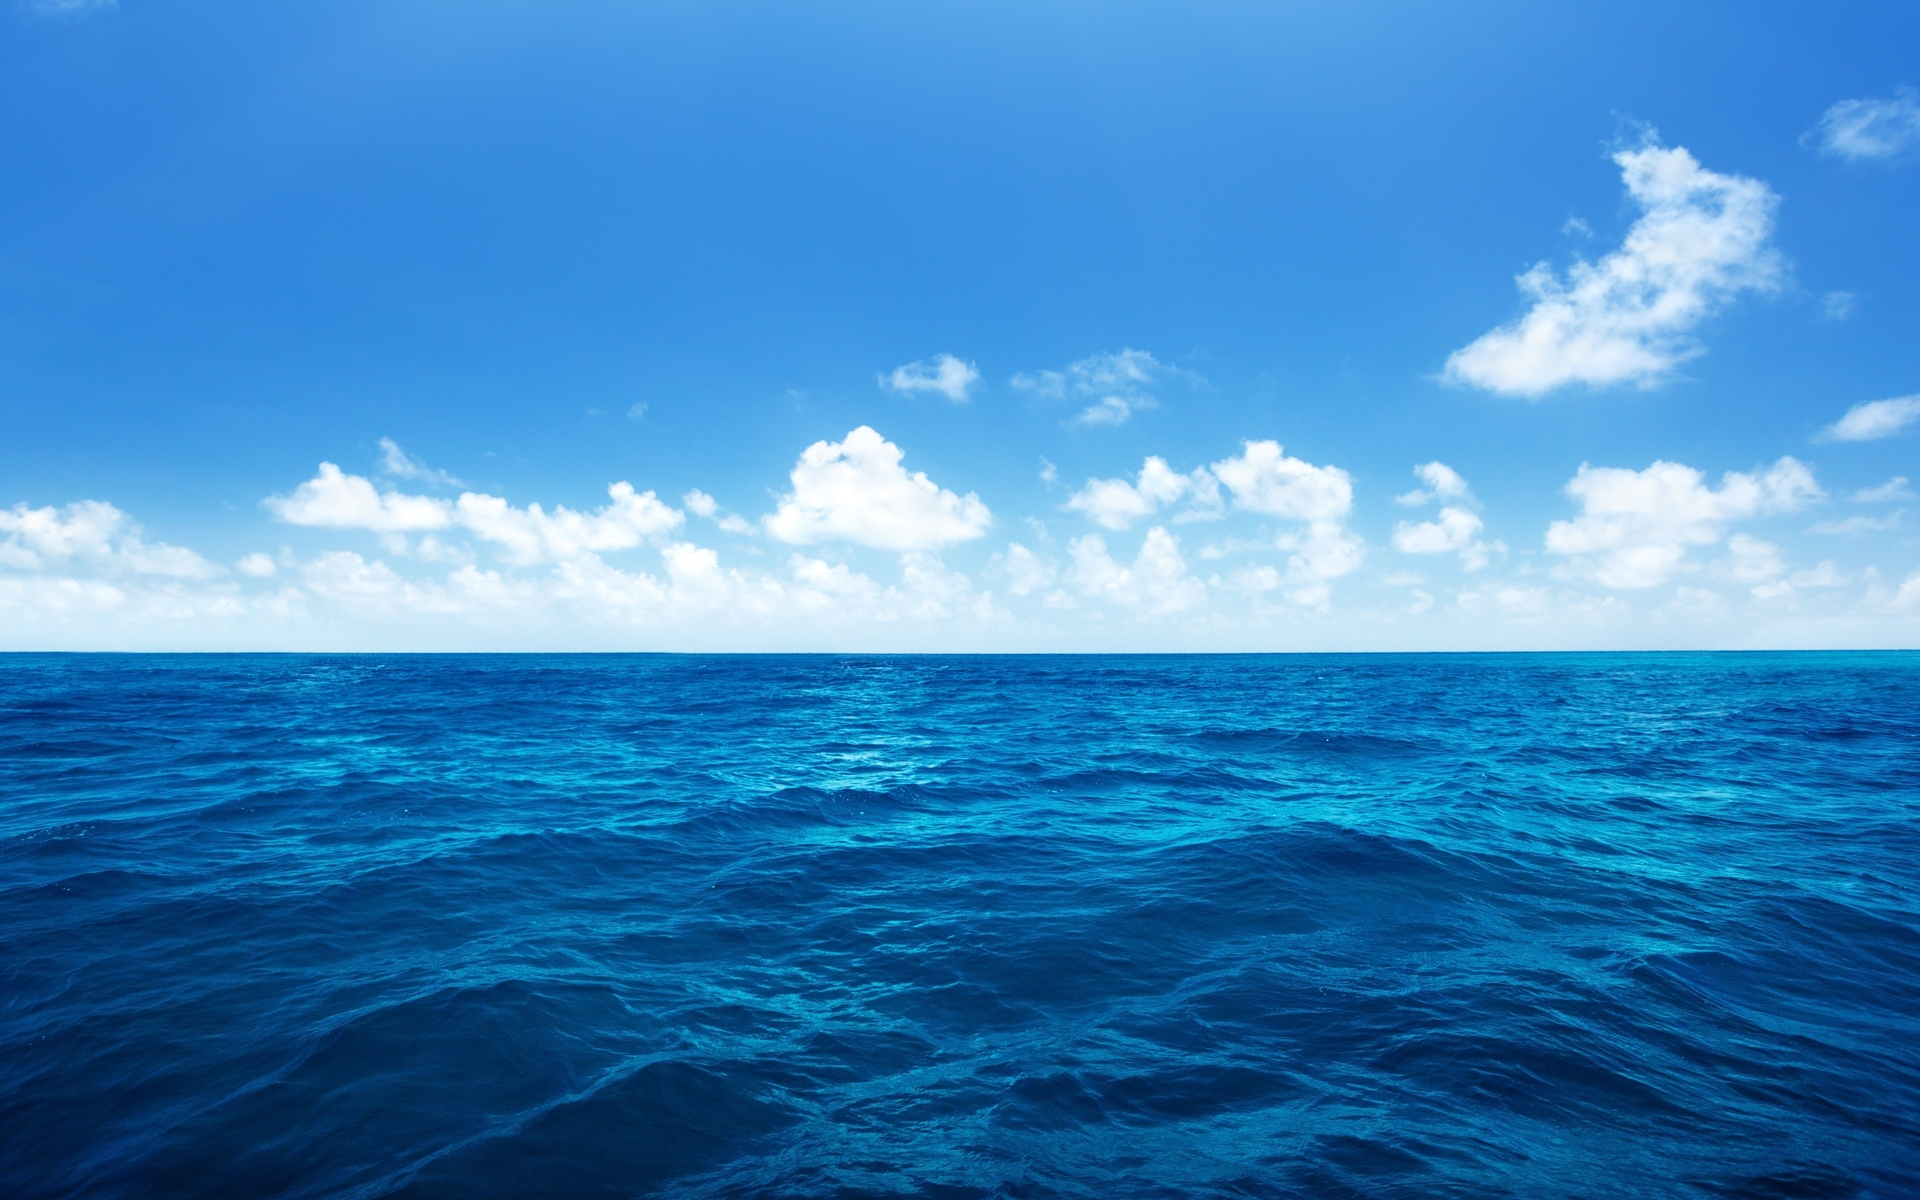 Blue_ocean_and_sky-1920x1200